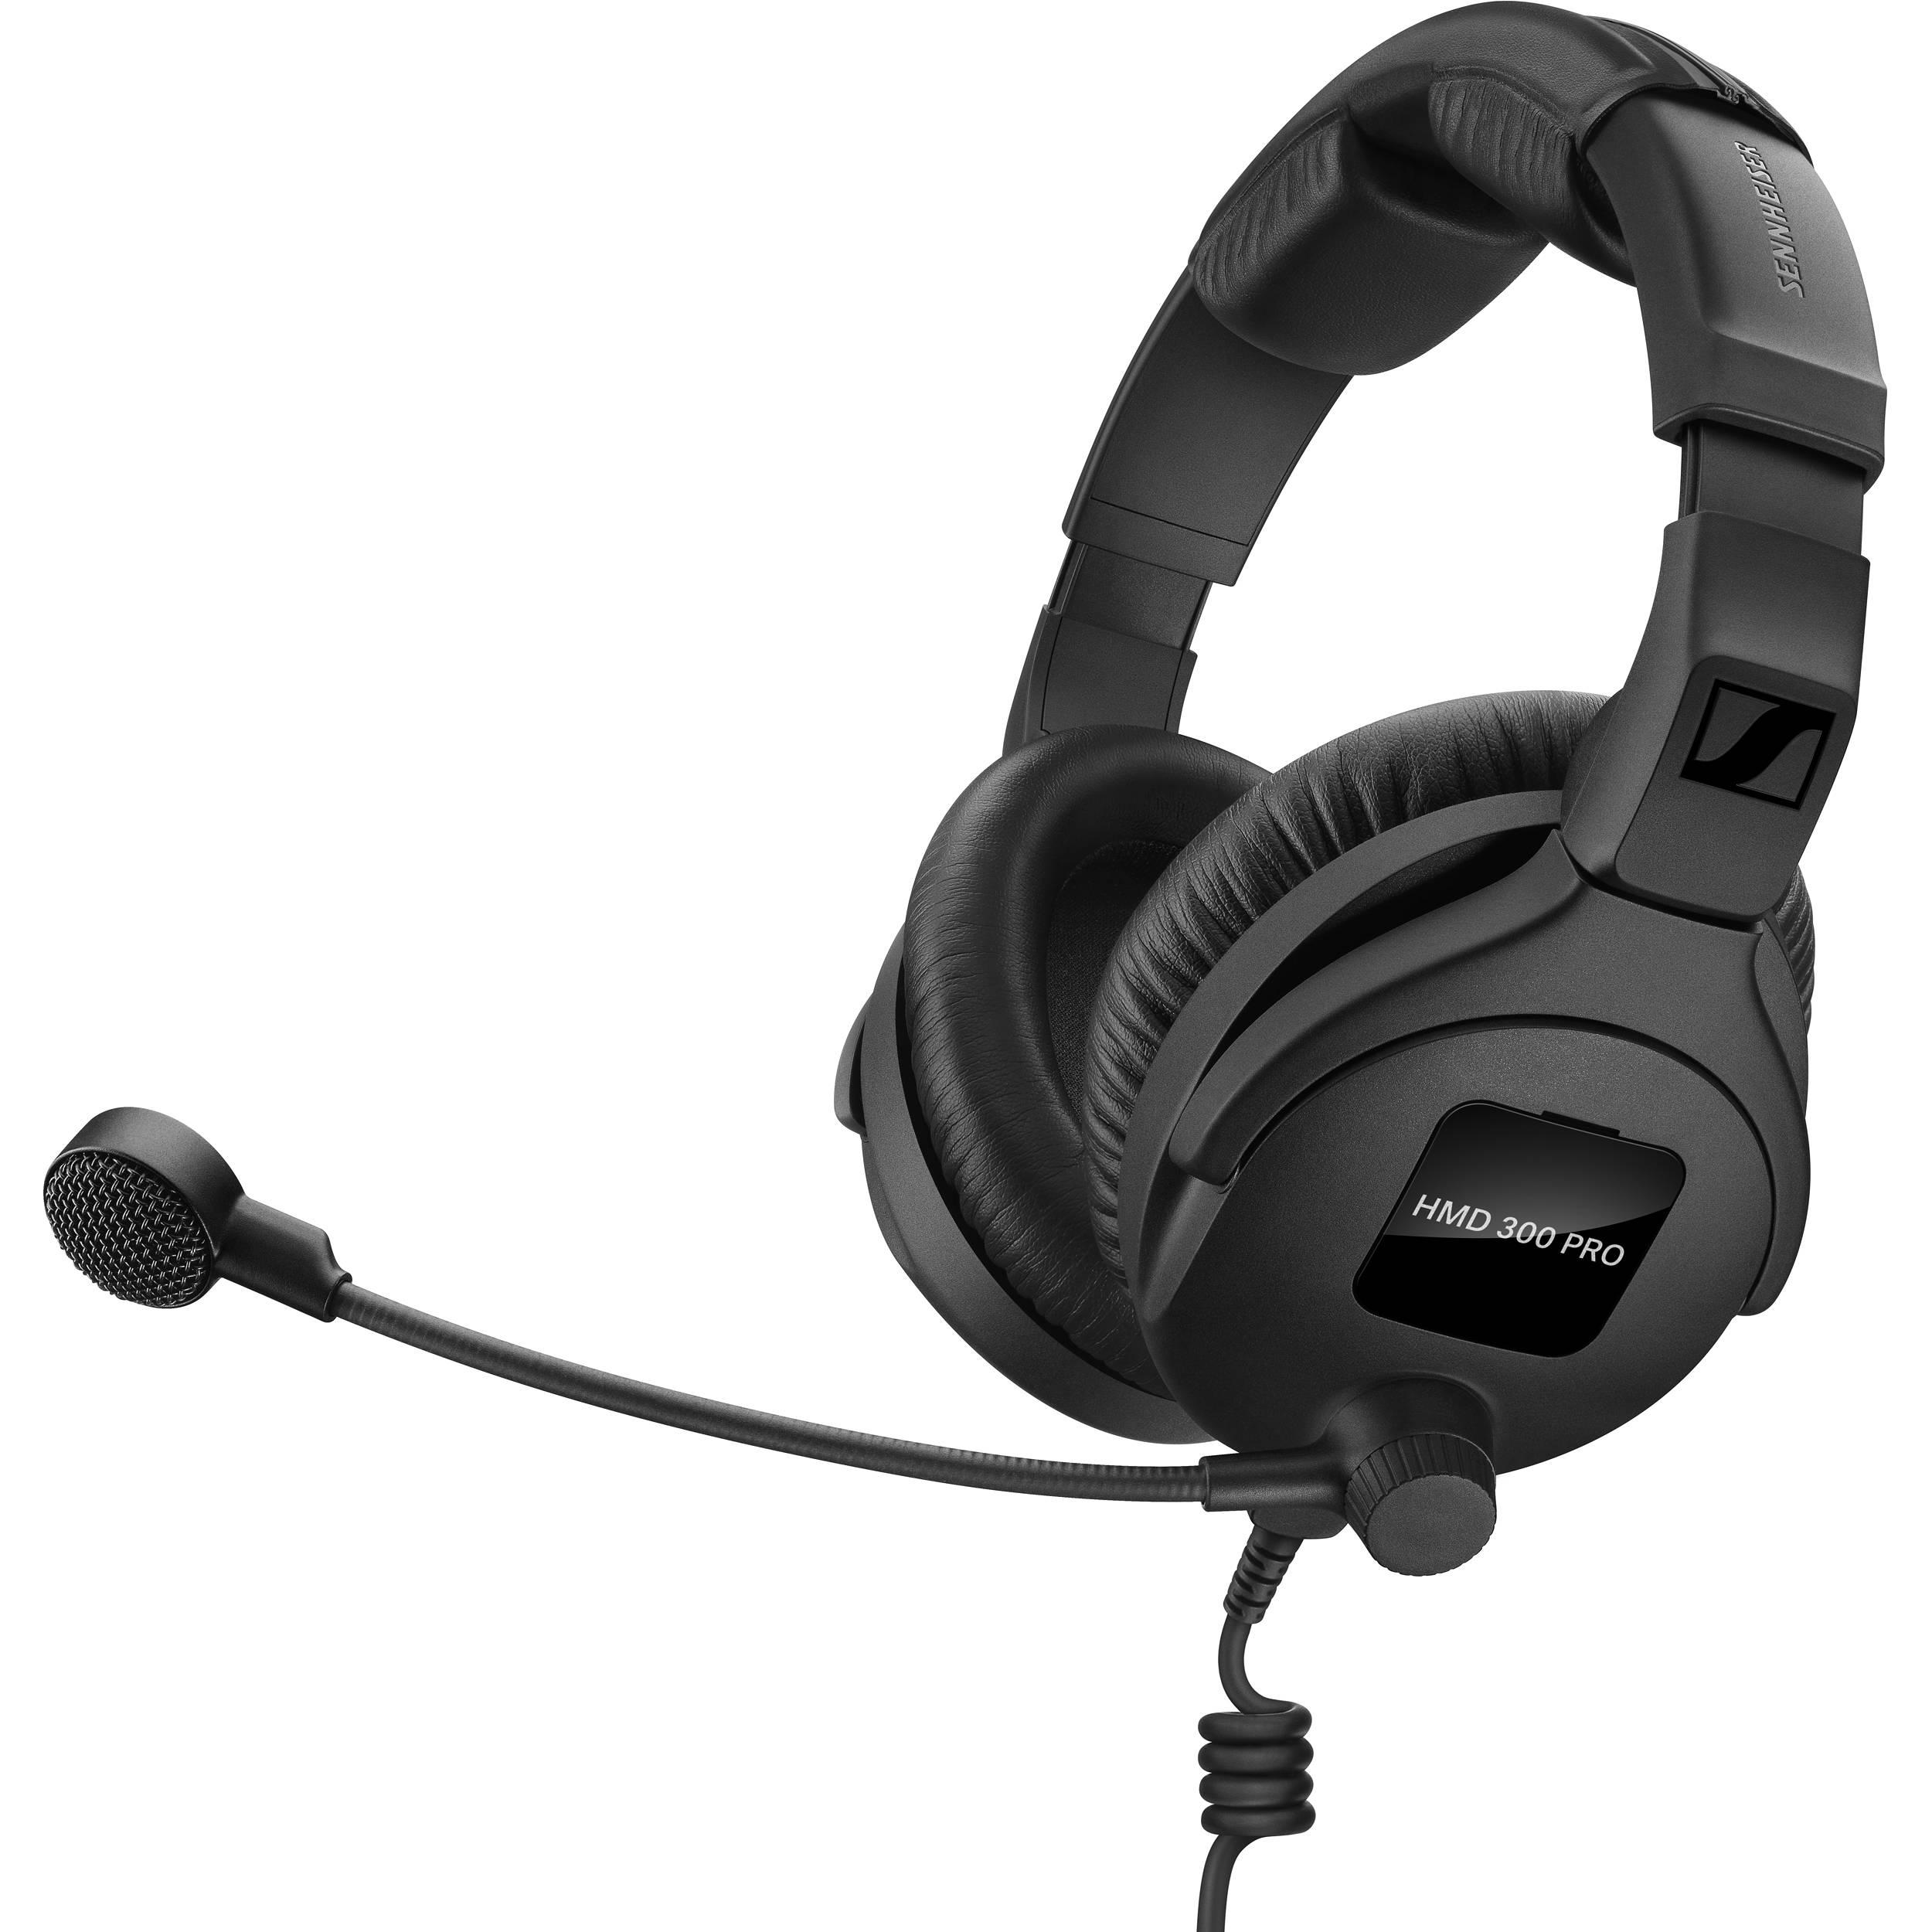 sennheiser hmd 300 pro headset with boom microphone 506900 b h. Black Bedroom Furniture Sets. Home Design Ideas